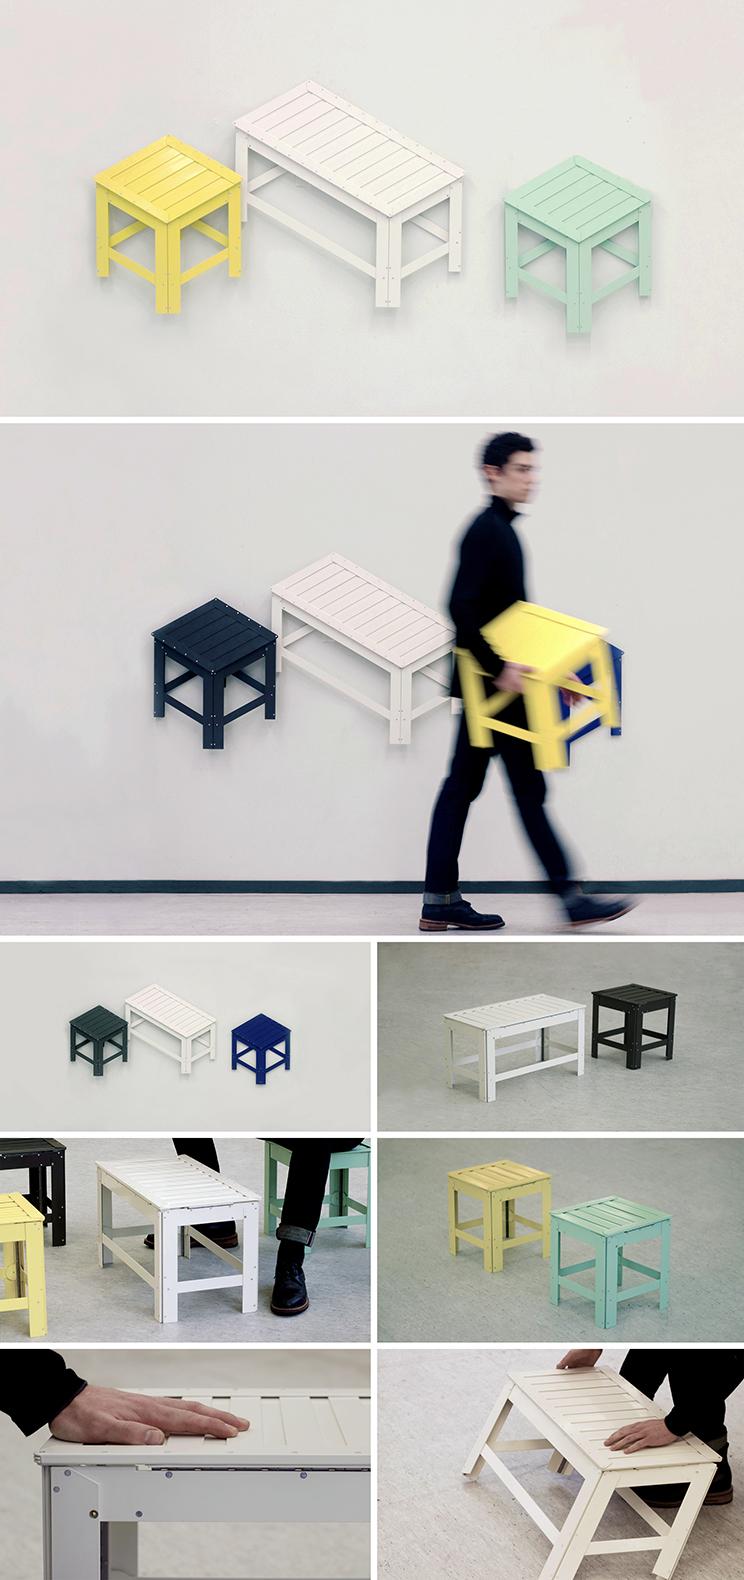 Projet De-Dimension du designer Jongha Choi